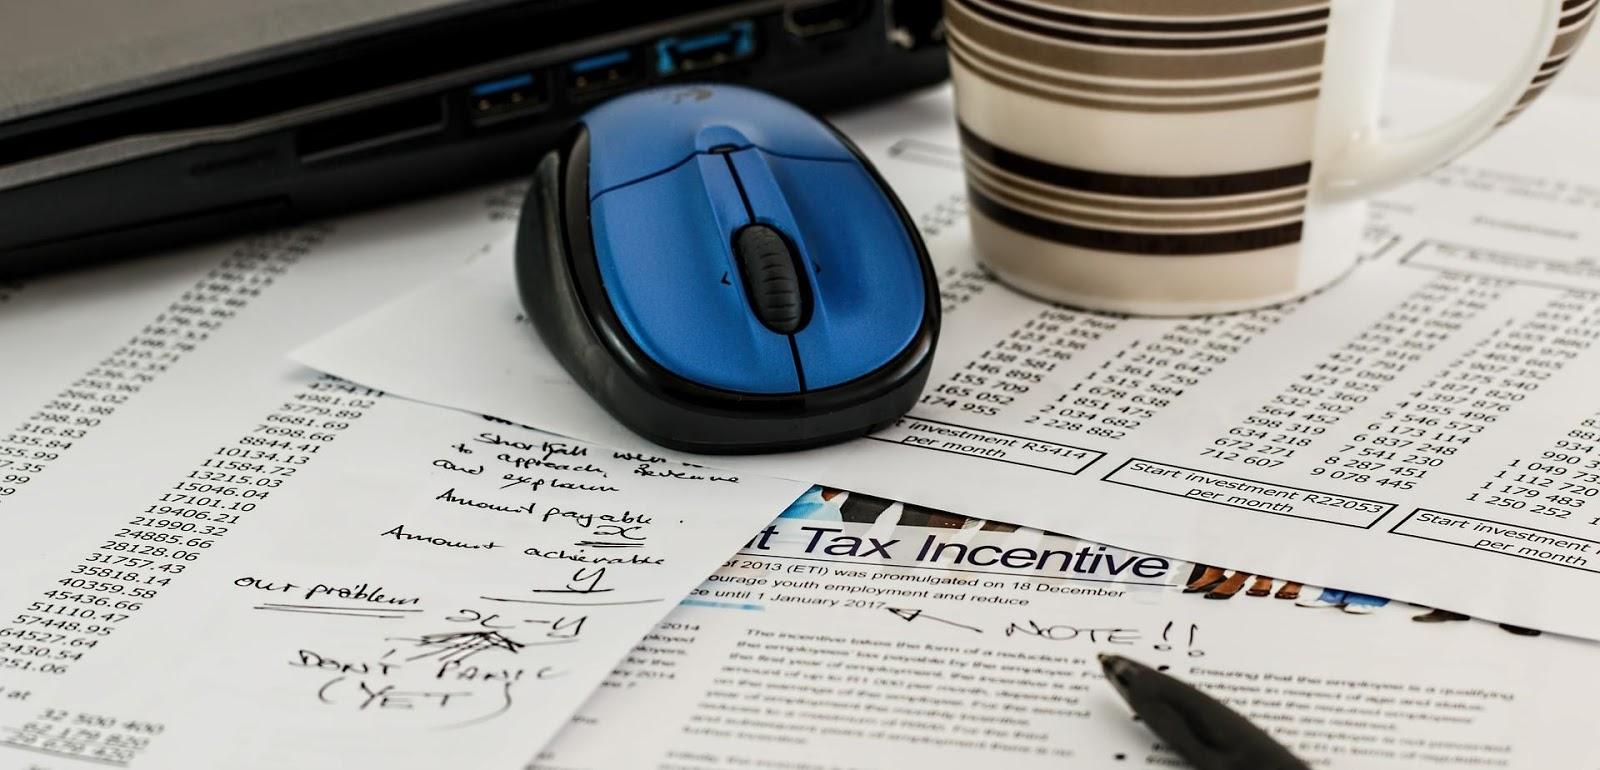 Jasa migrasi LibreOffice office suite dan Thunderbird email client